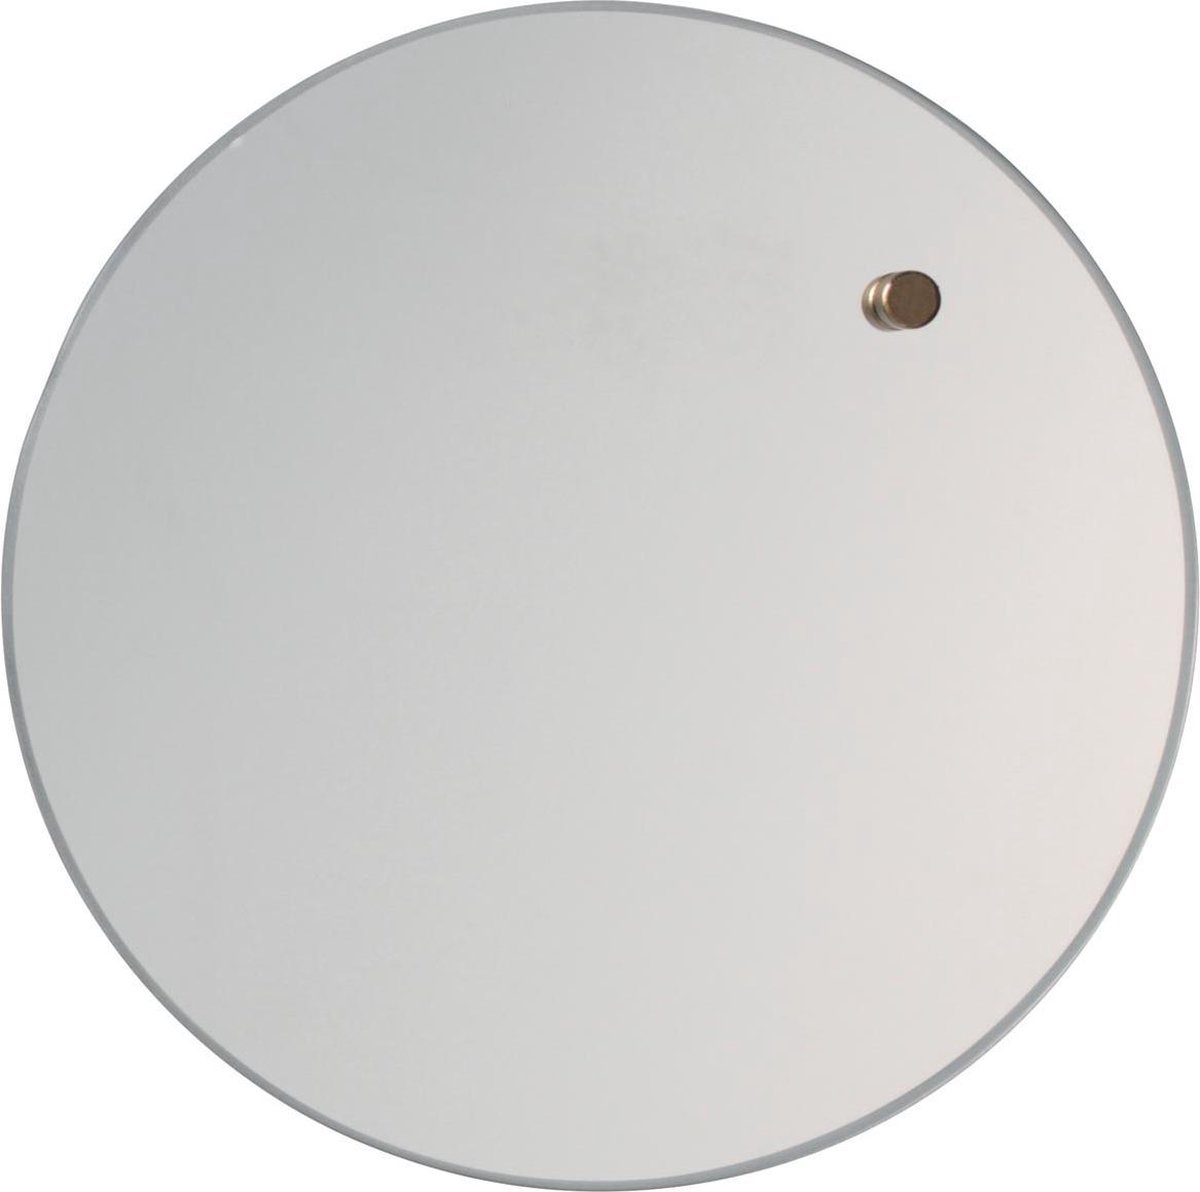 NAGA Nord Memobord spiegel glas 25cm